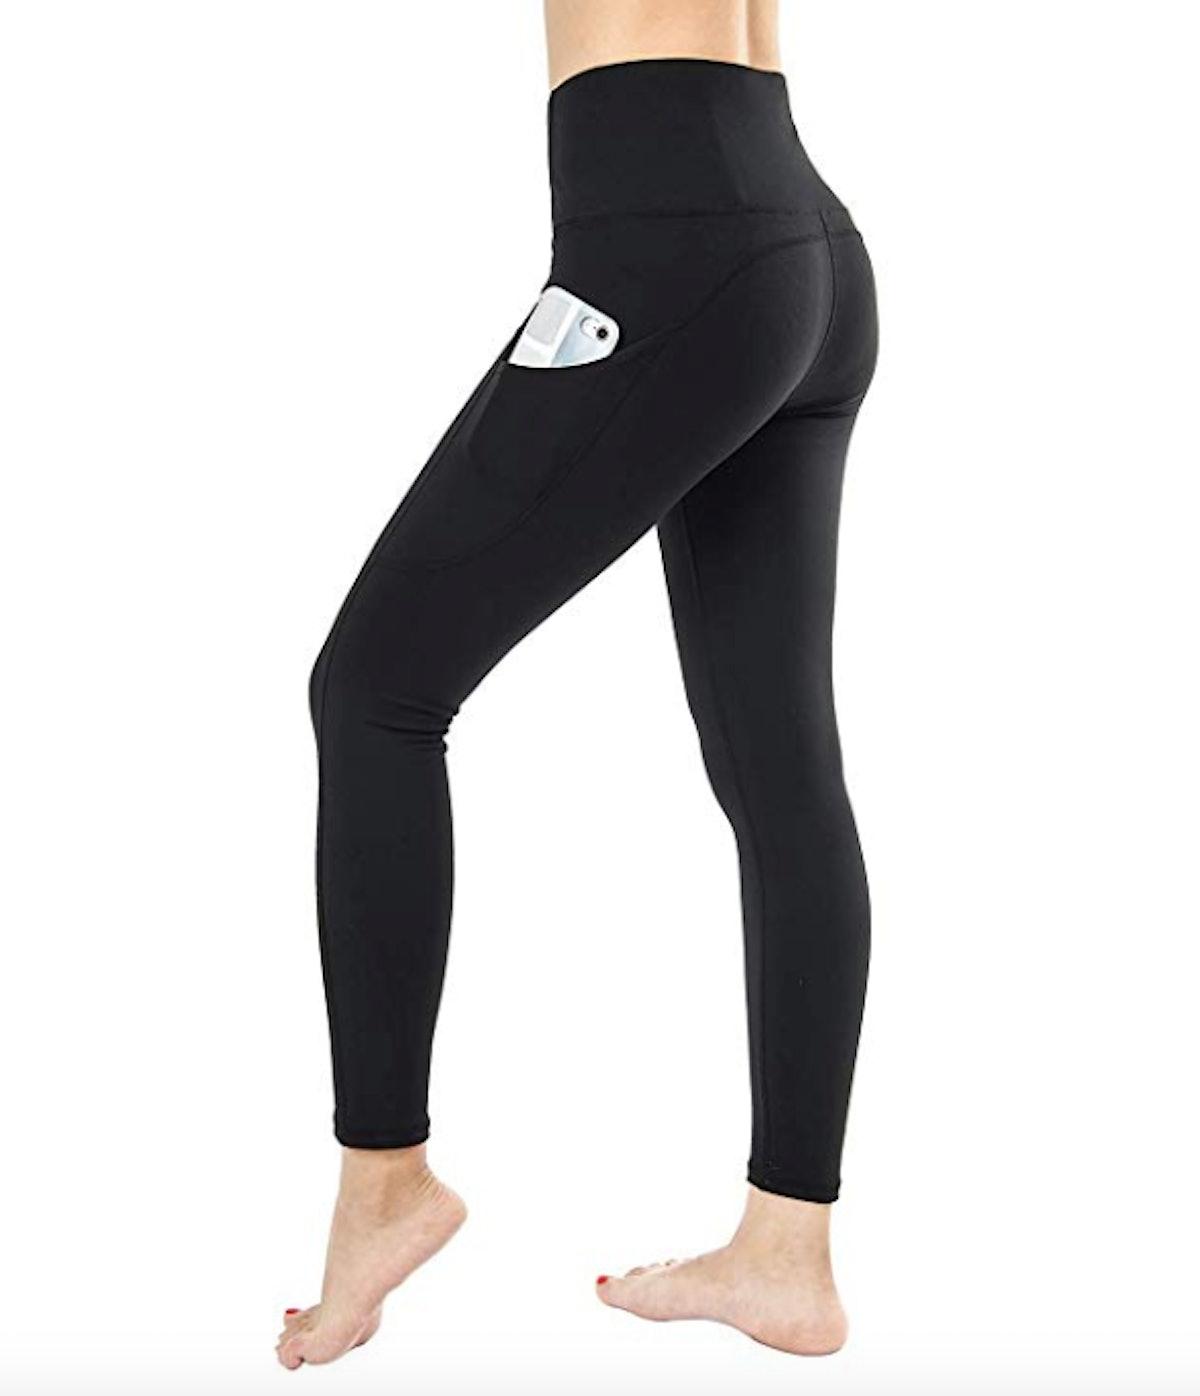 Dragon Fit Compression Yoga Pants